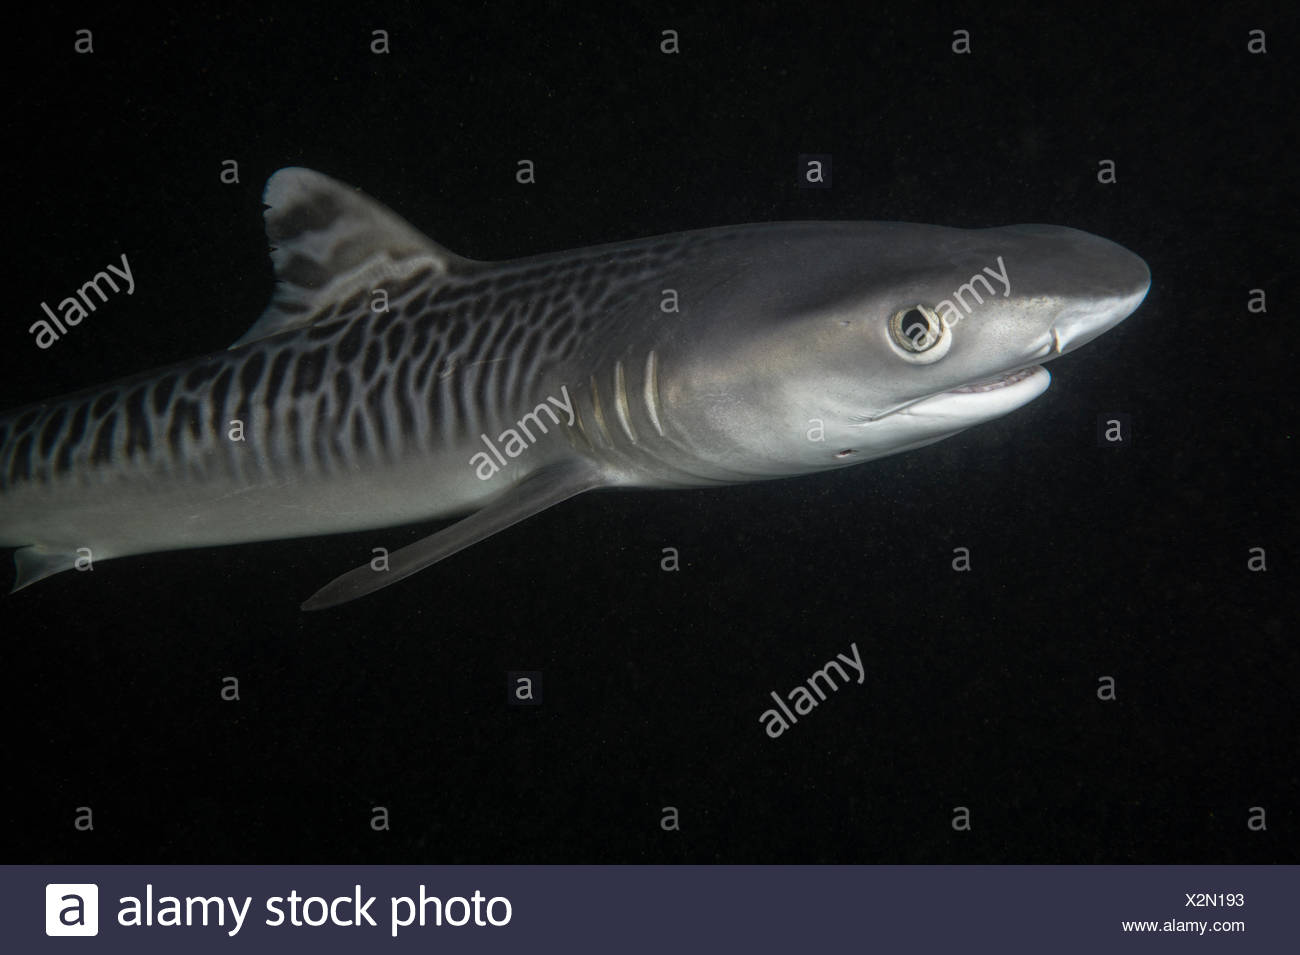 A newborn tiger shark pup has distinct striped markings along its three-foot body. - Stock Image